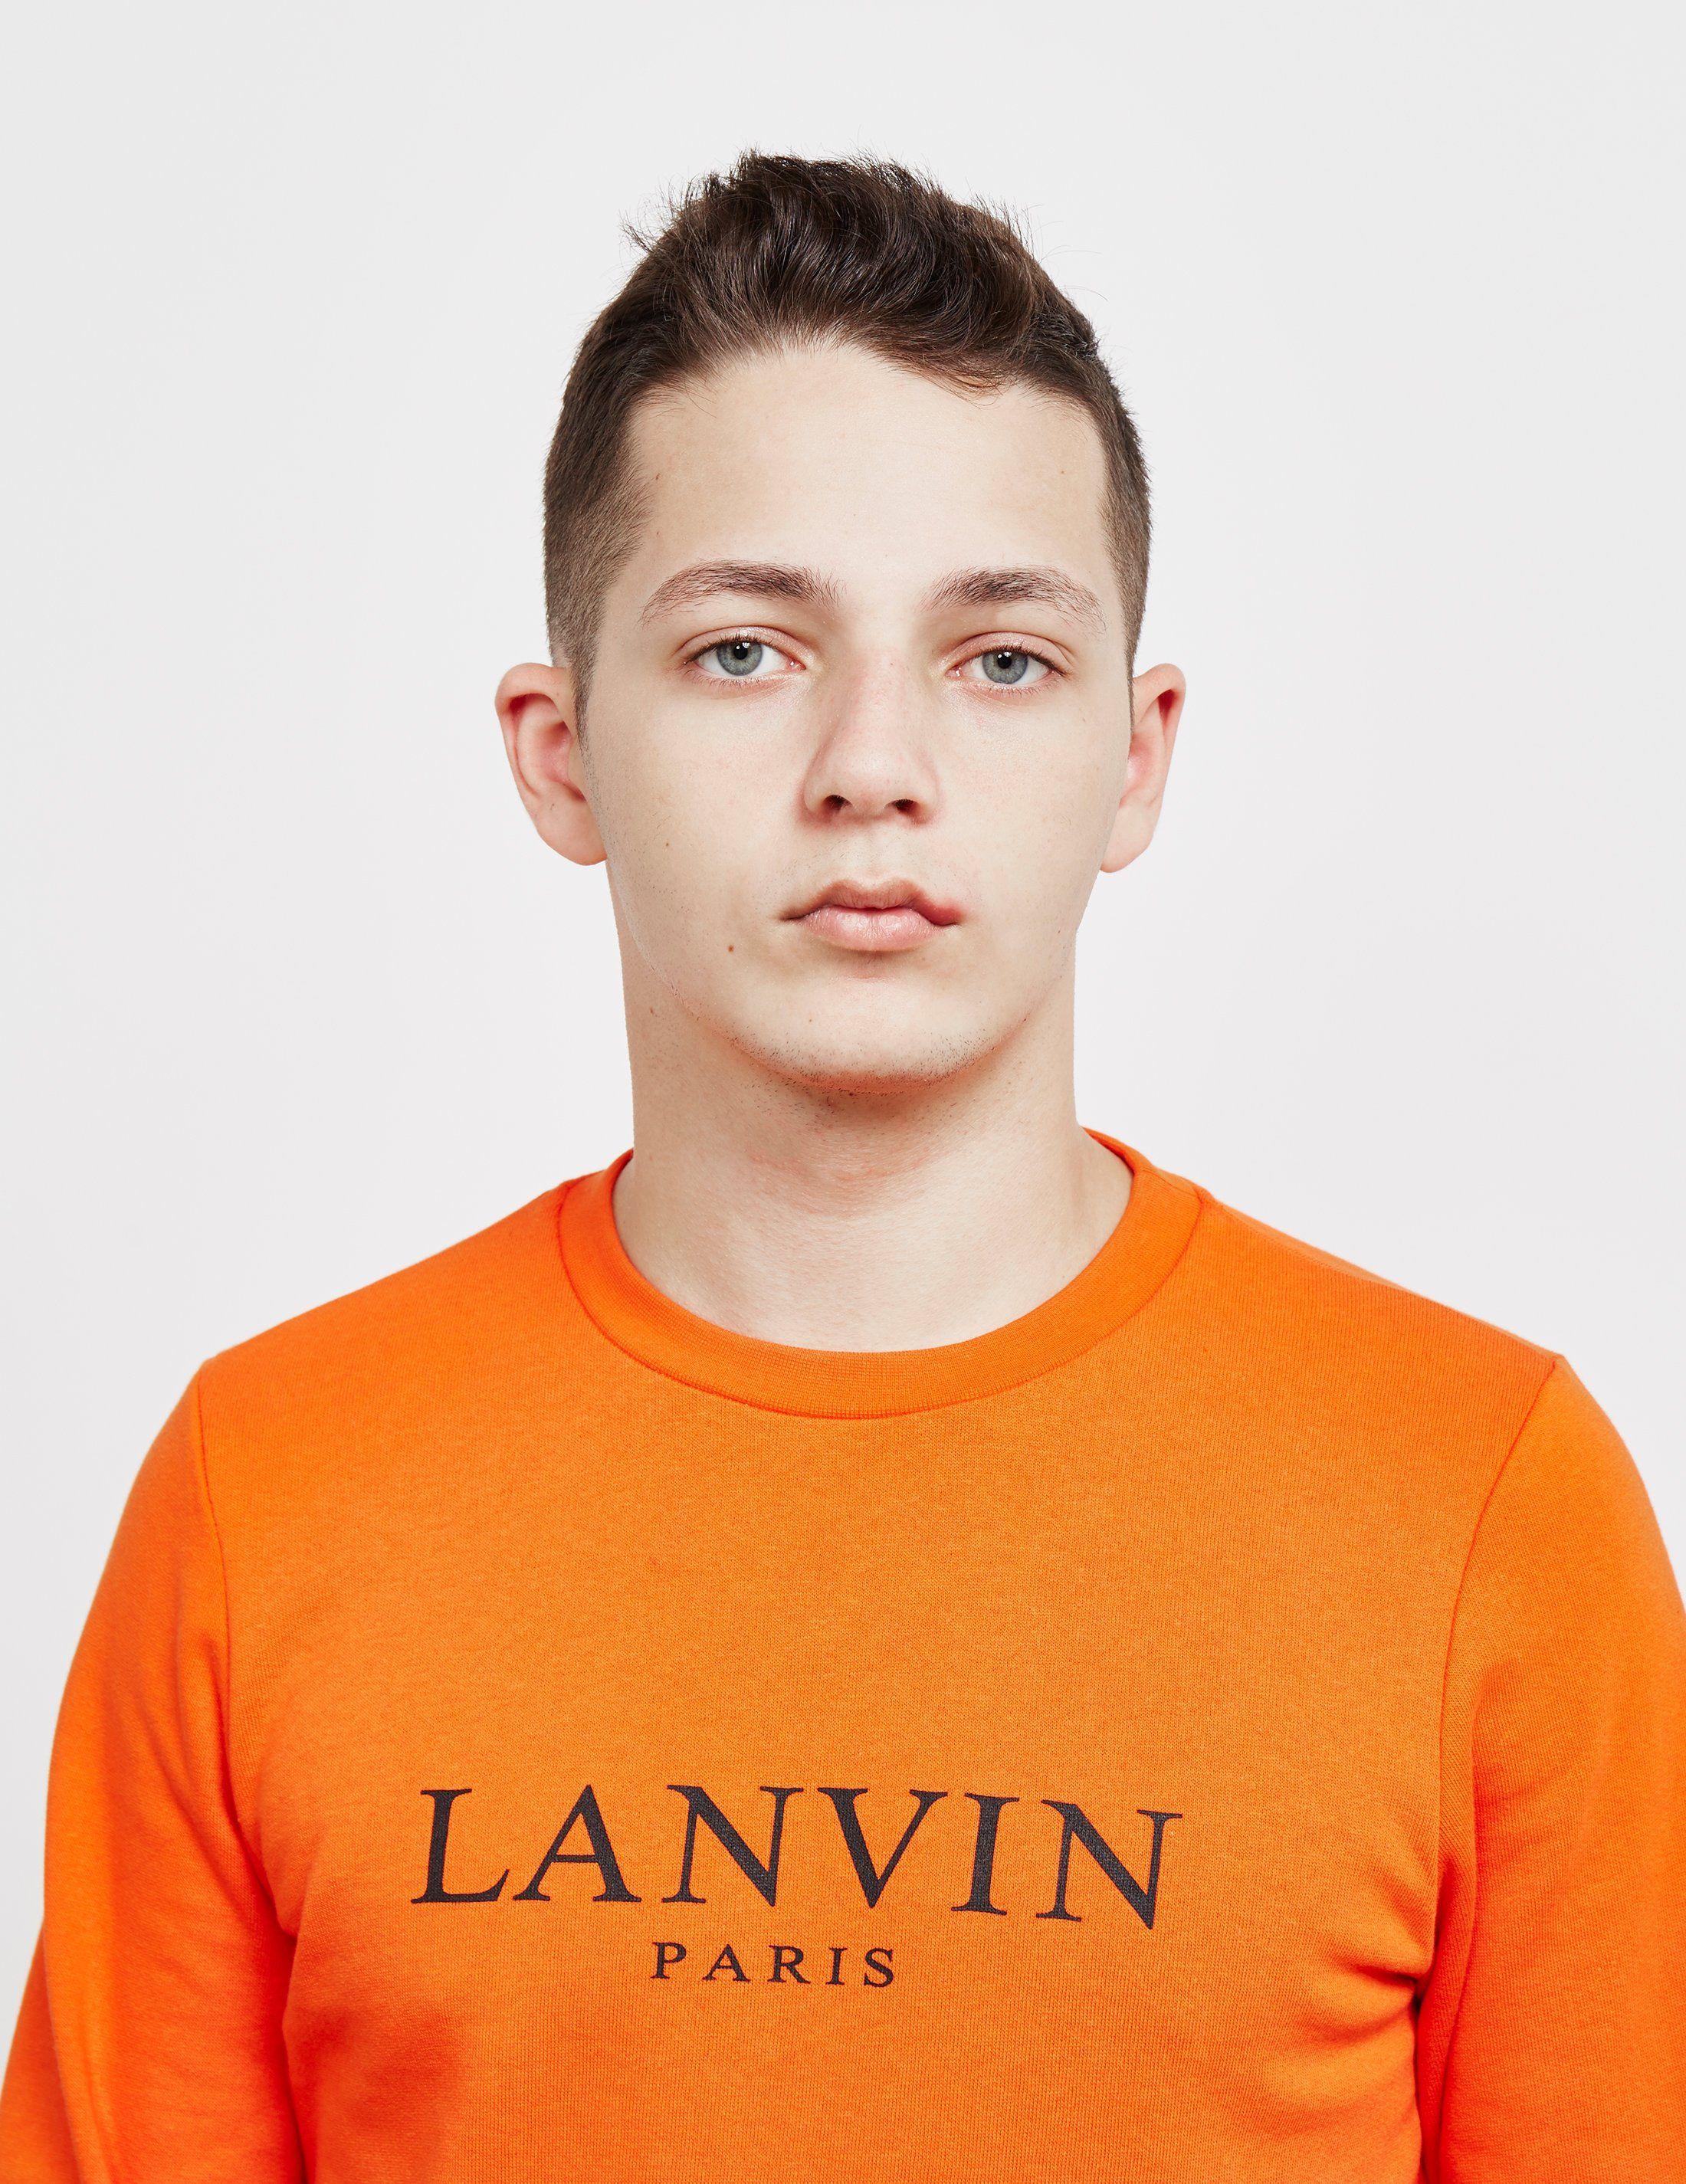 Lanvin Logo Sweatshirt